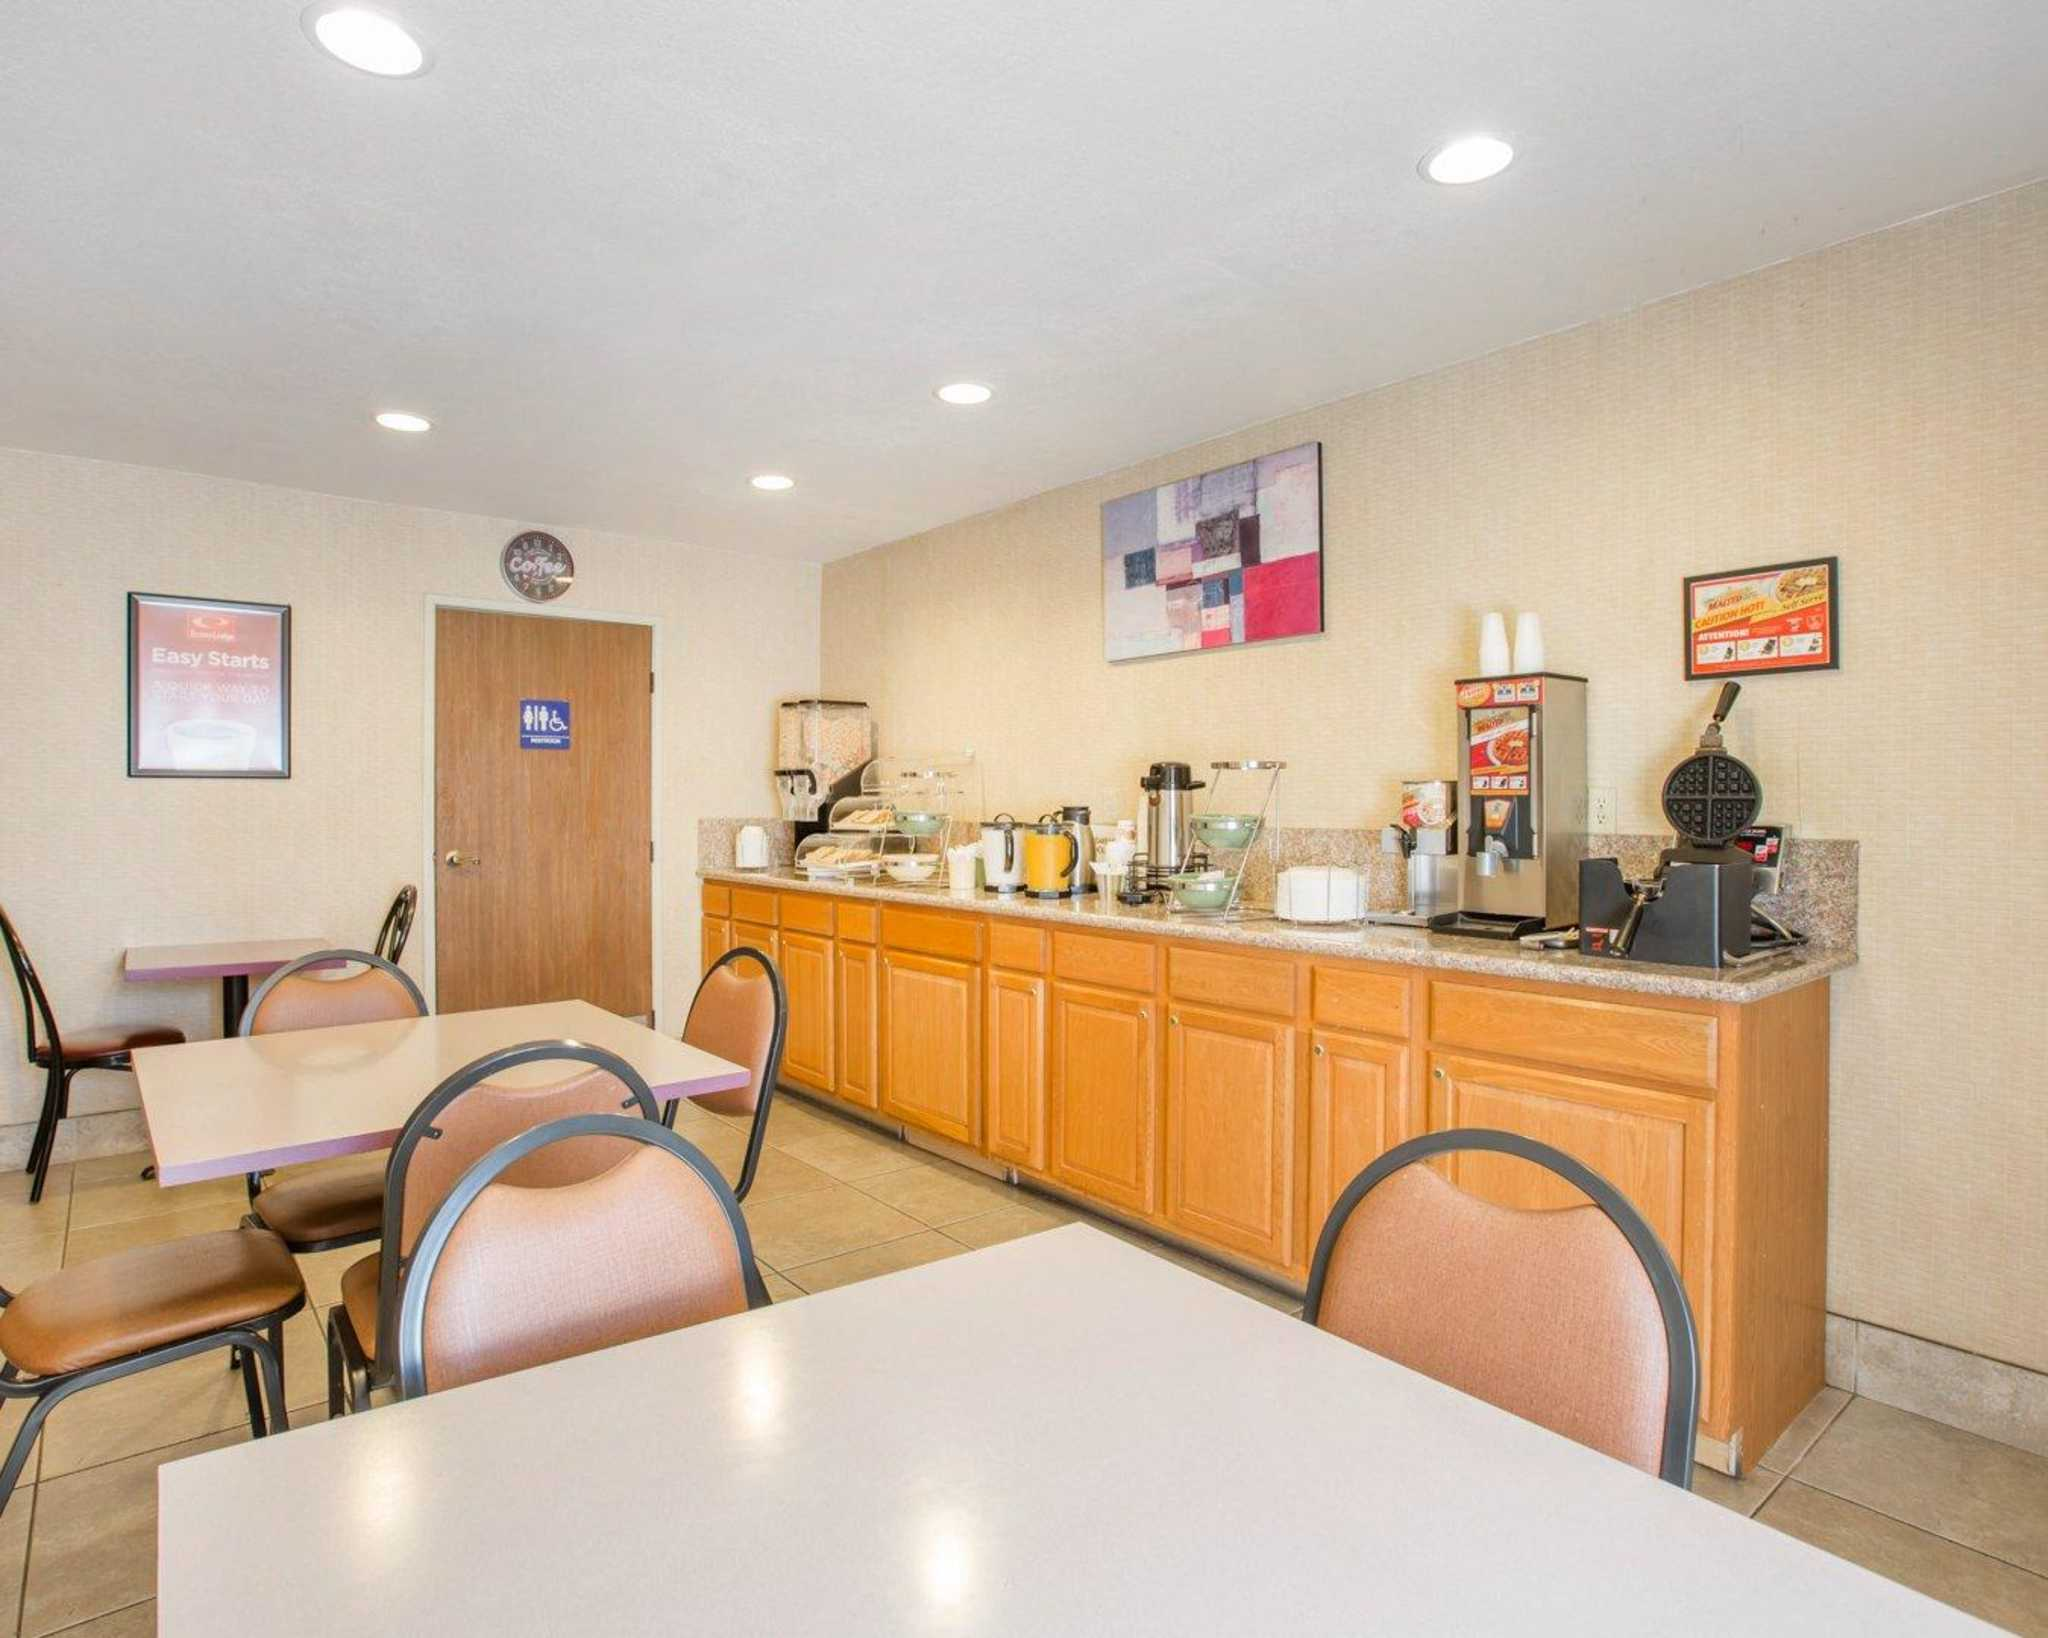 Econo Lodge Inn & Suites Lodi image 12